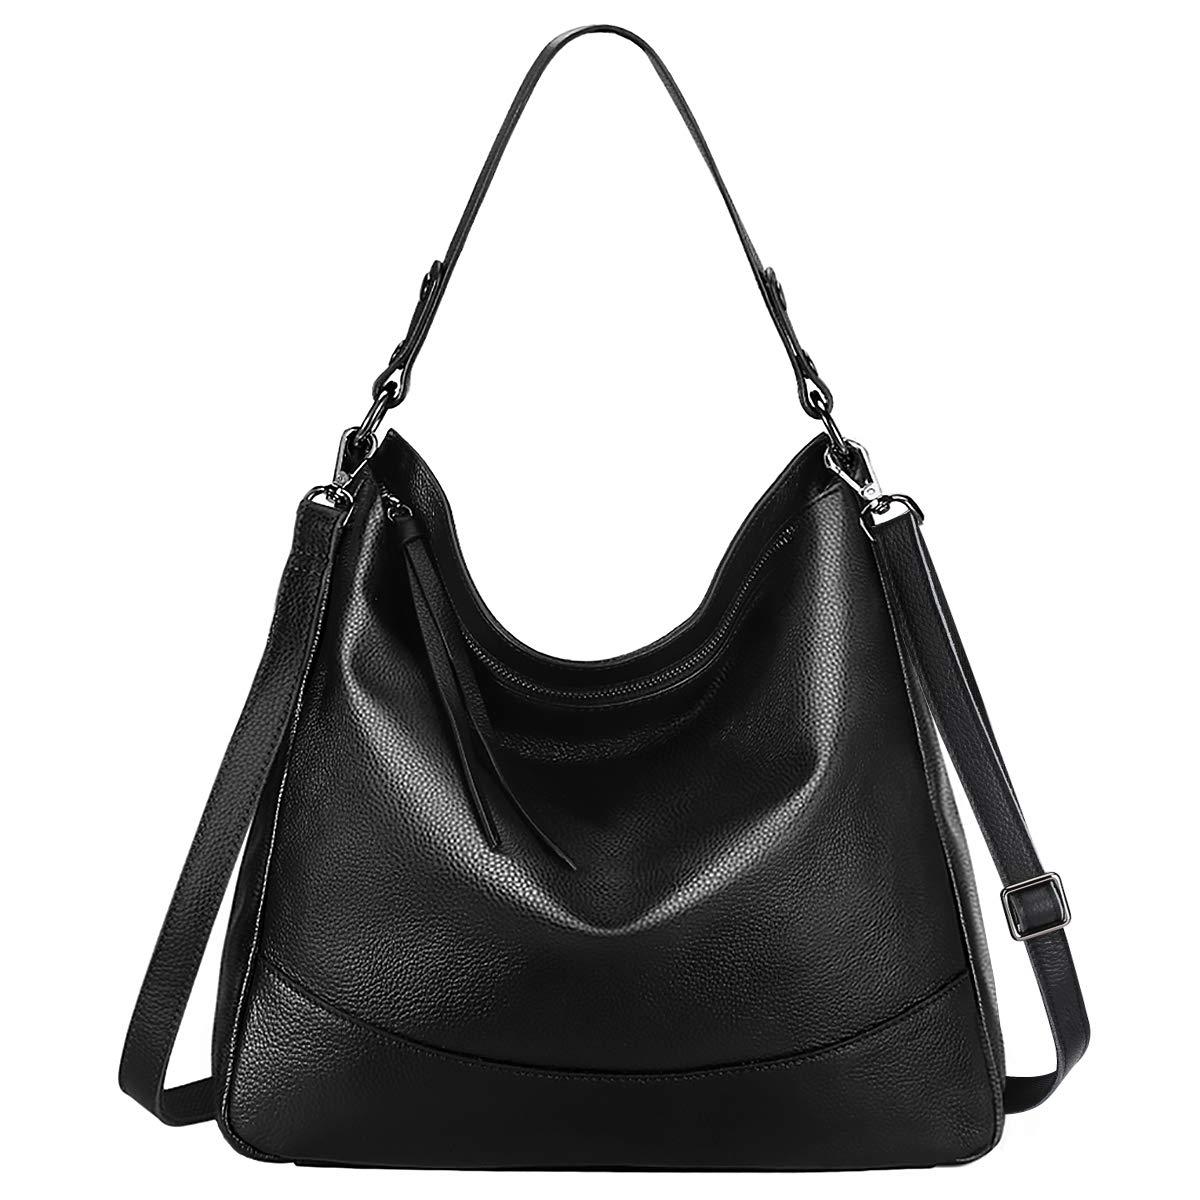 S-ZONE Women's Genuine Leather Handbag Hobo Bag Large Tote Shoulder Bag Crossbody Bag (Black)